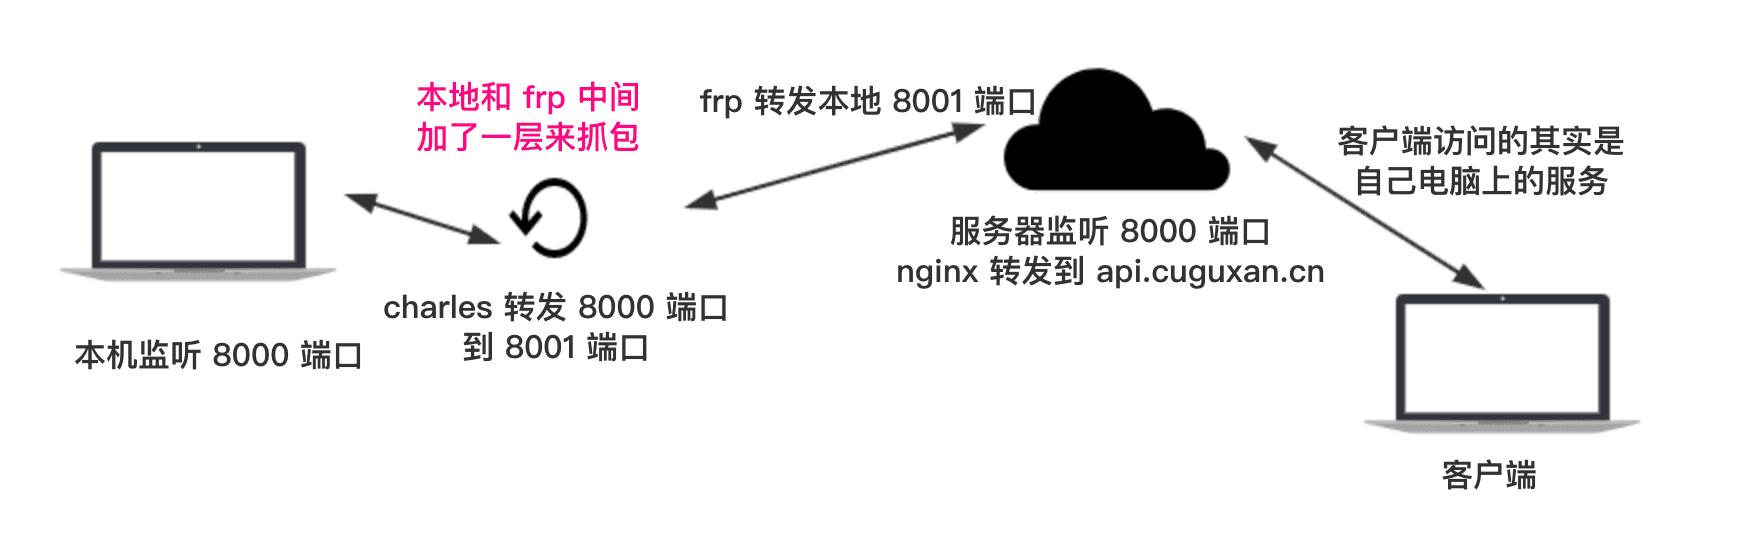 site-network-model